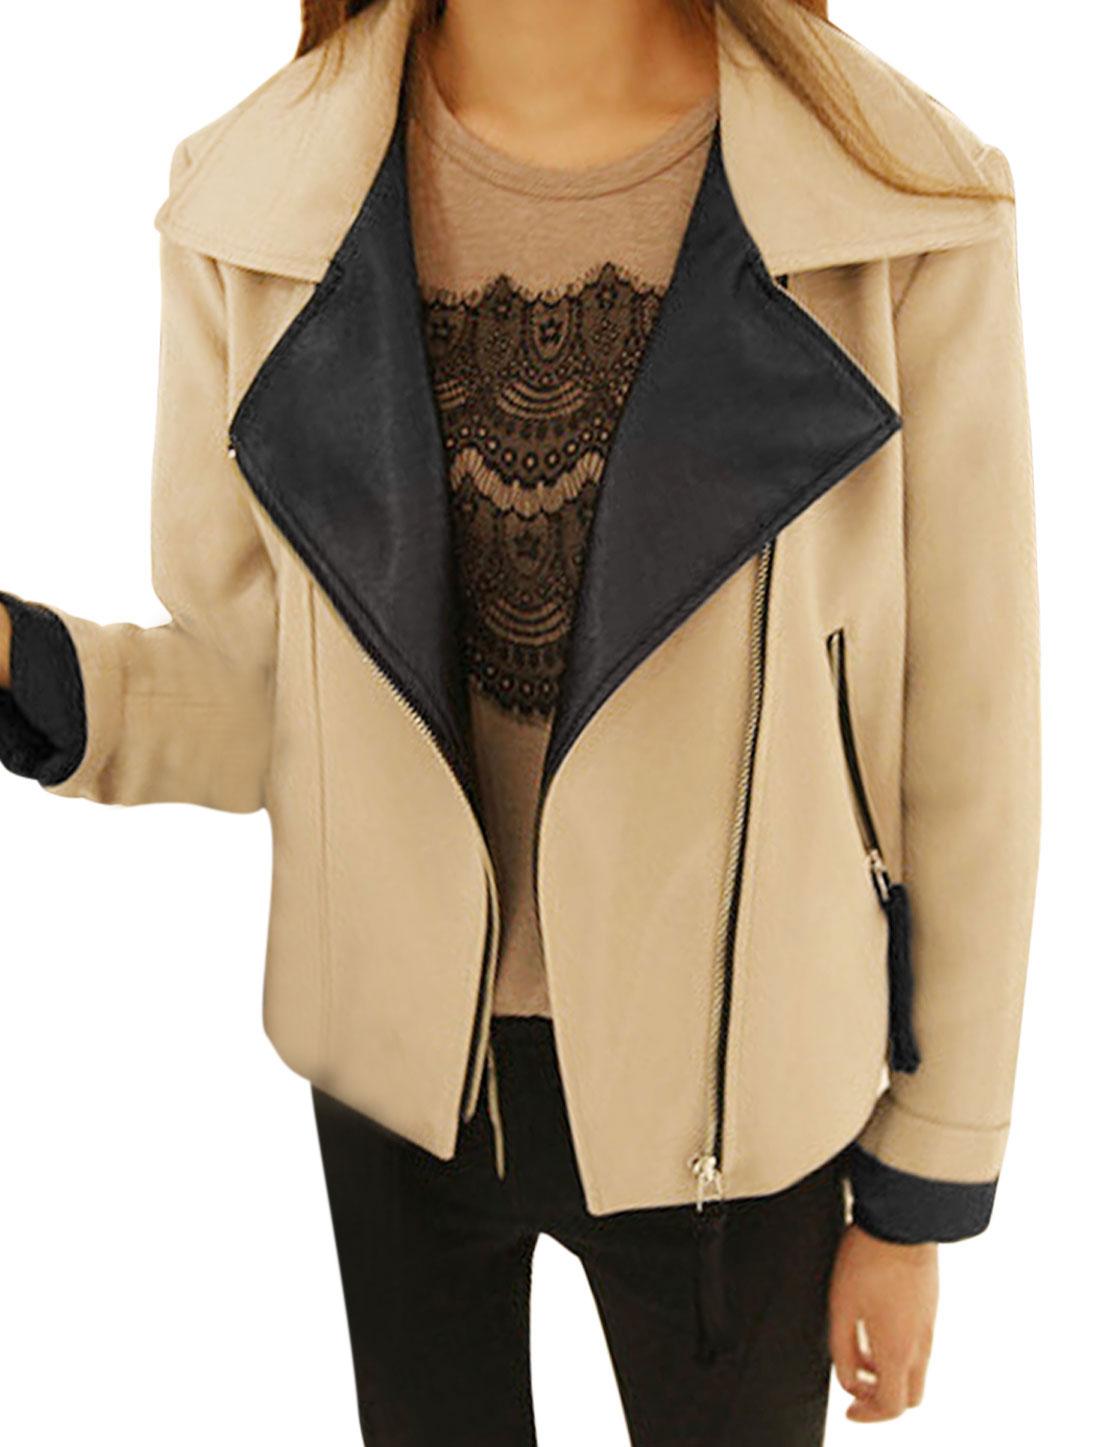 Lady Notched Lapel Zip Up Two Zipper Slant Pocket Casual Jacket Khaki S